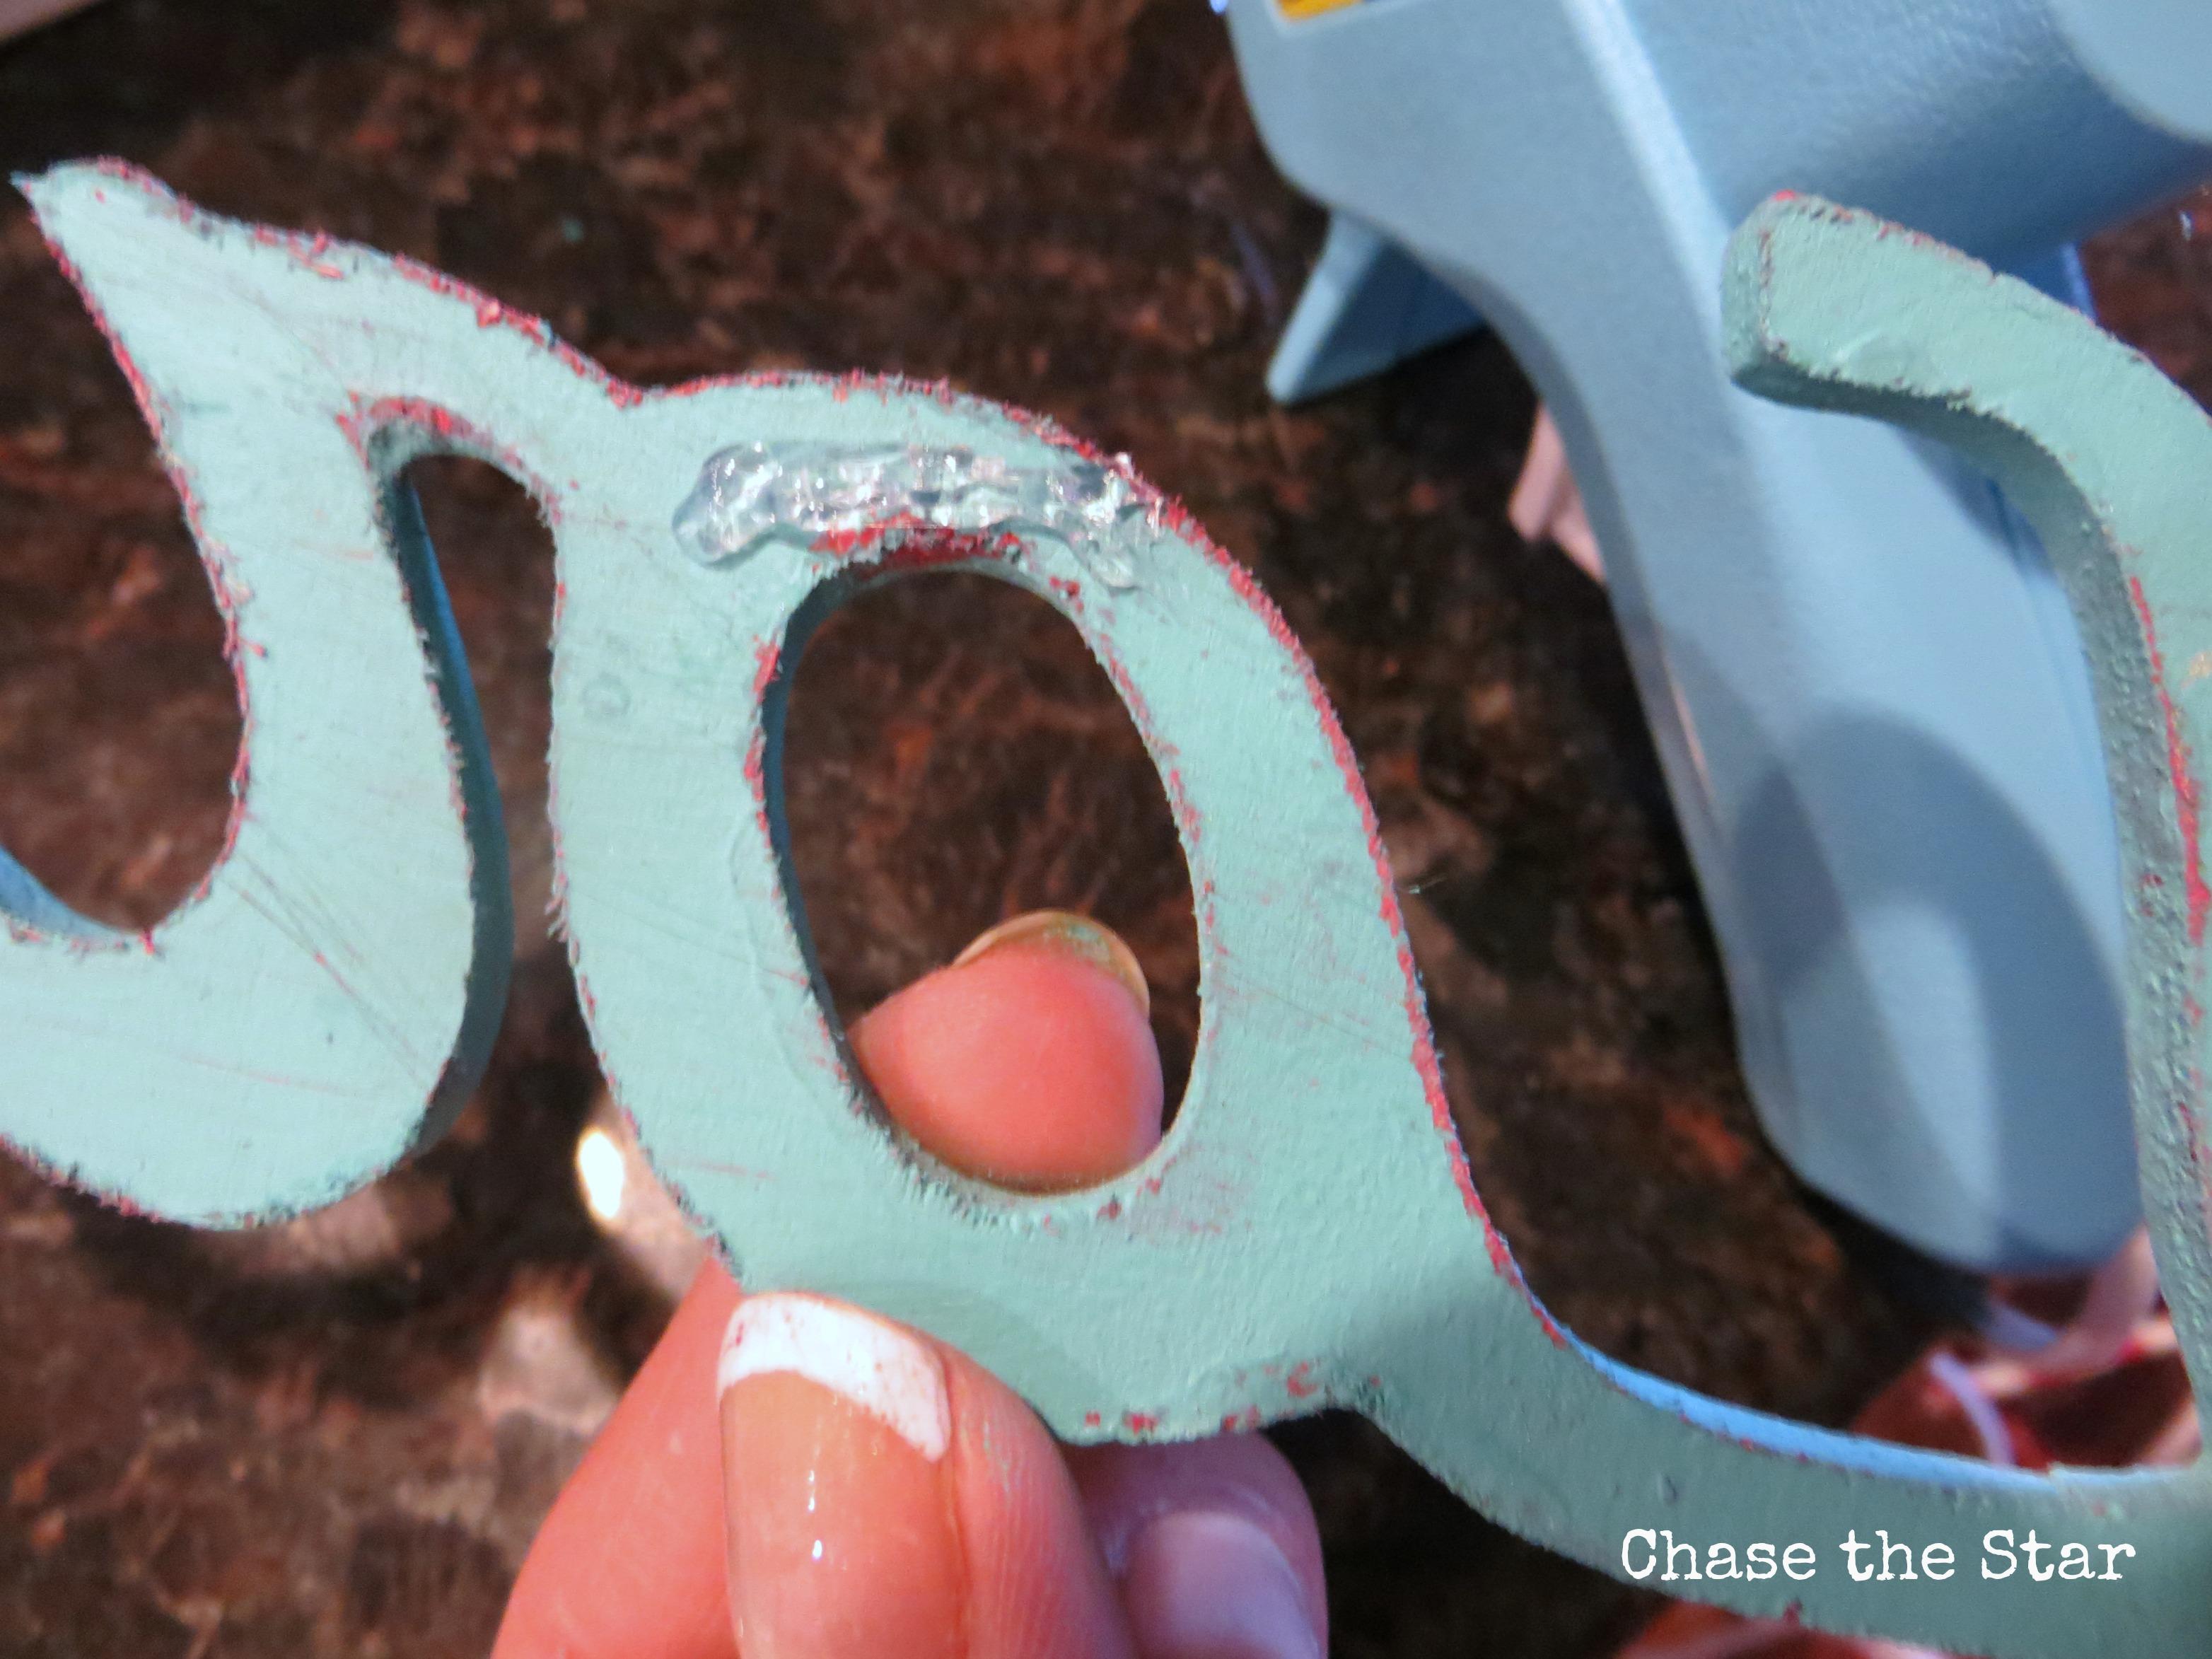 wood applique, blue, mixed paint, distress, hot glue, sunburst, love, valentines, diy, craft